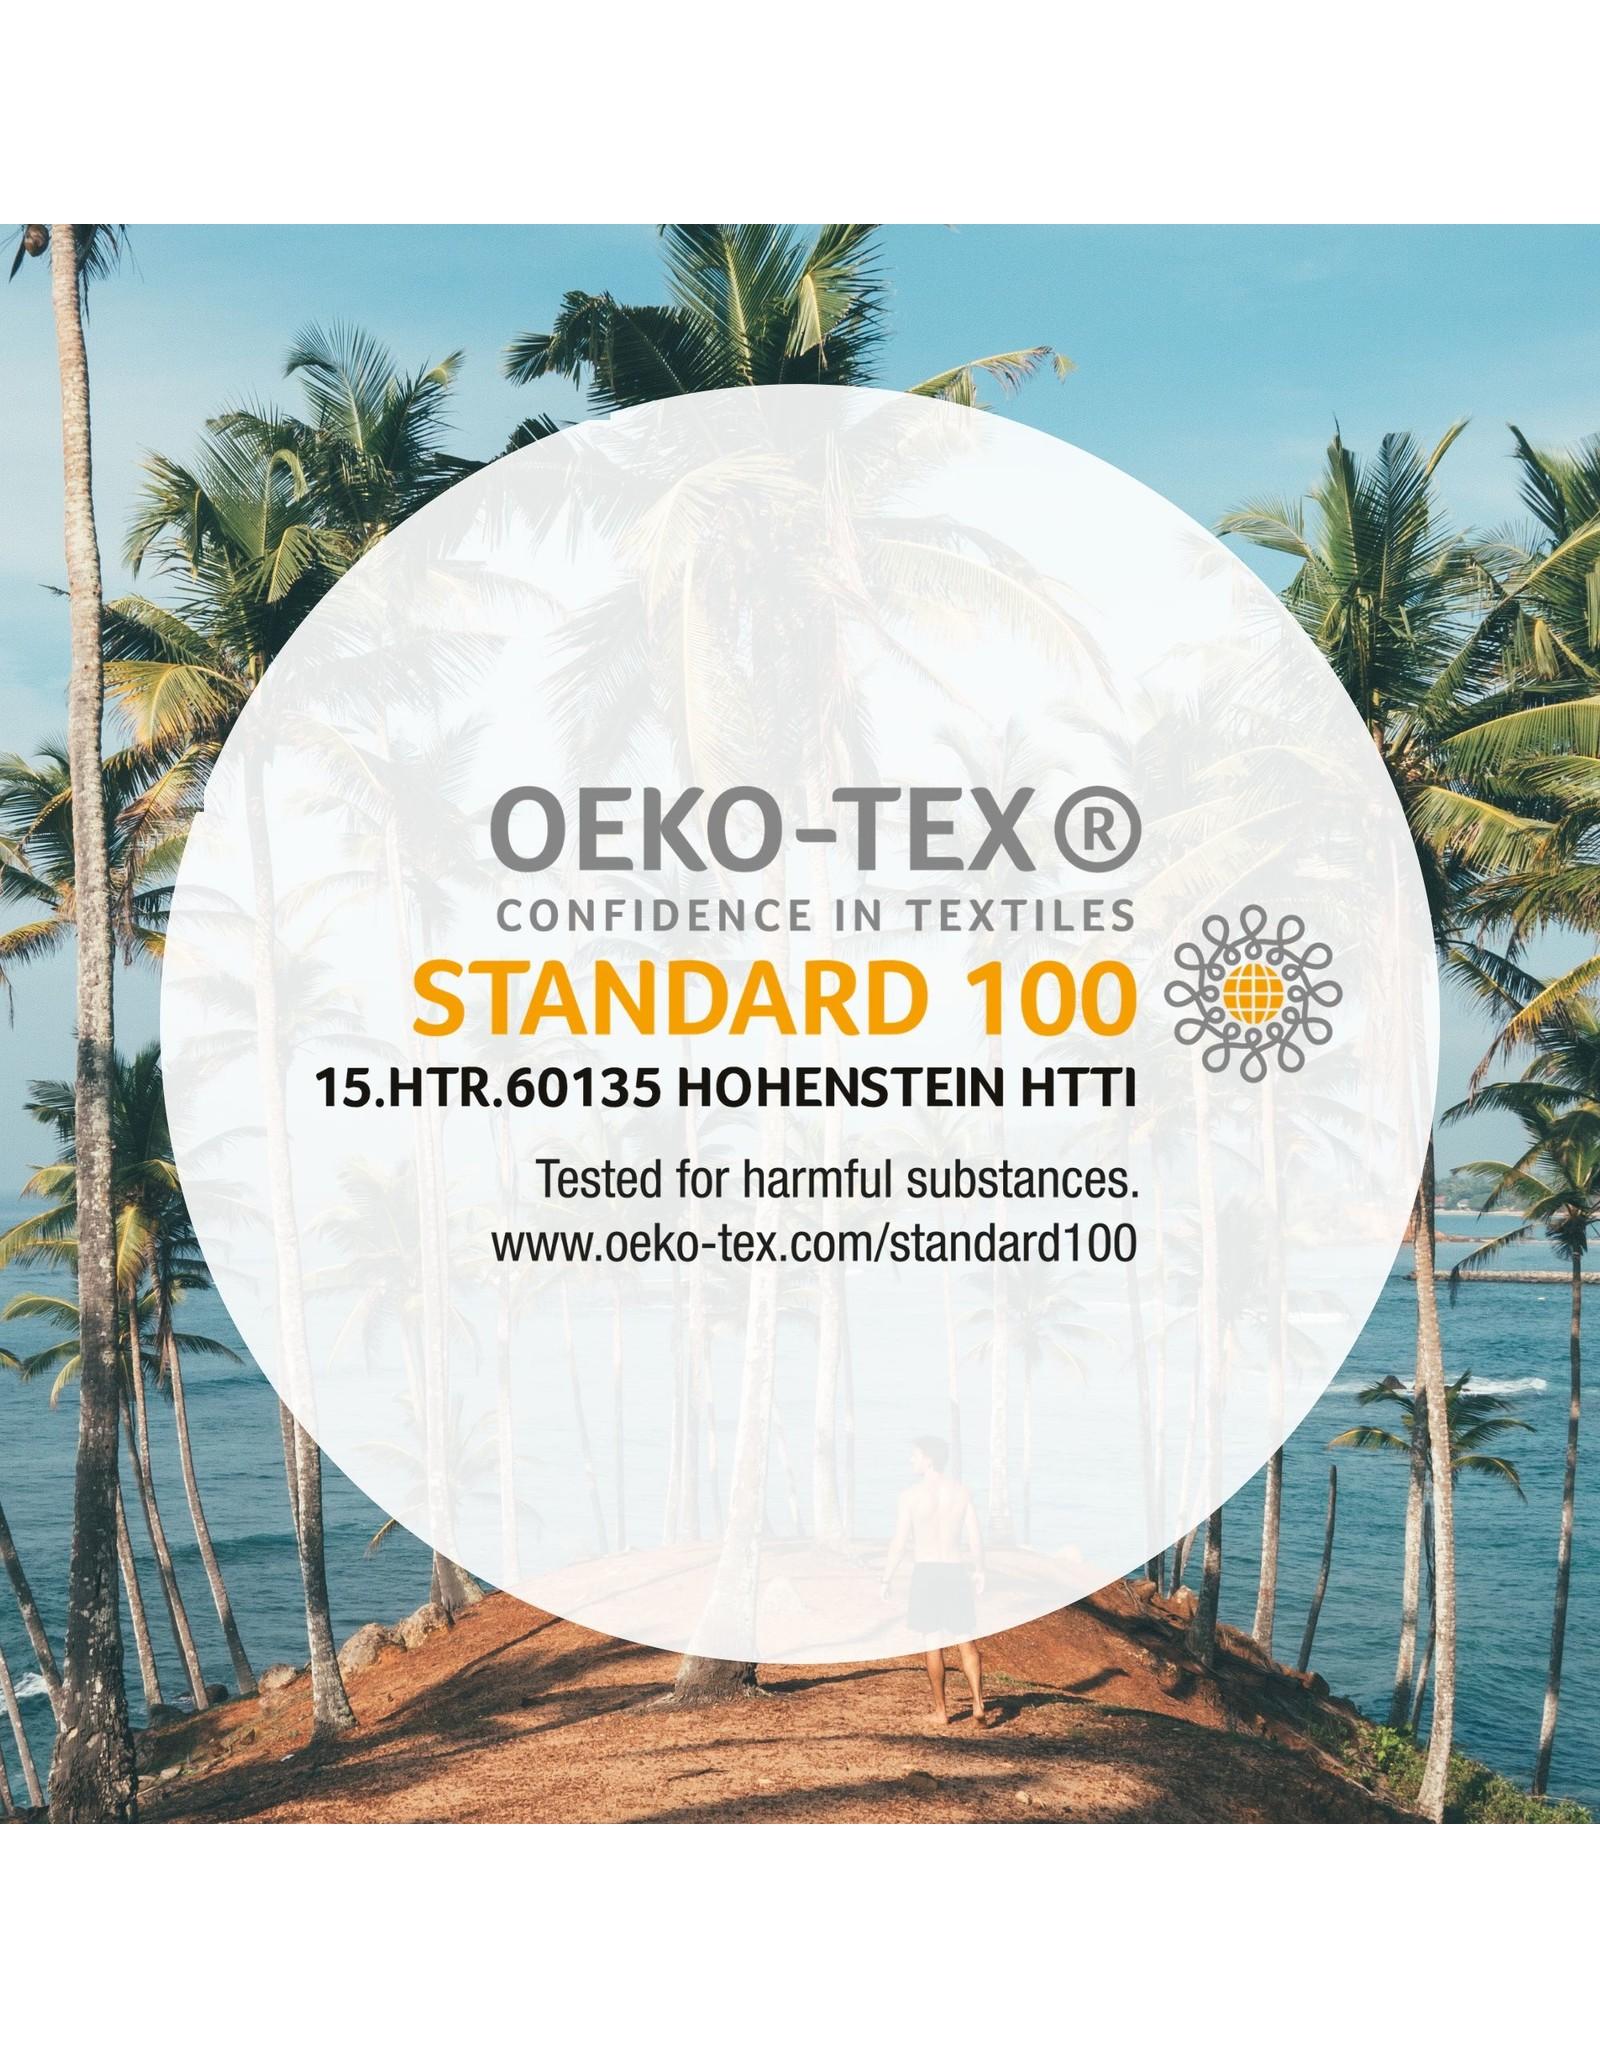 Towel to go Bali blau/grün 100%BW oeko tex